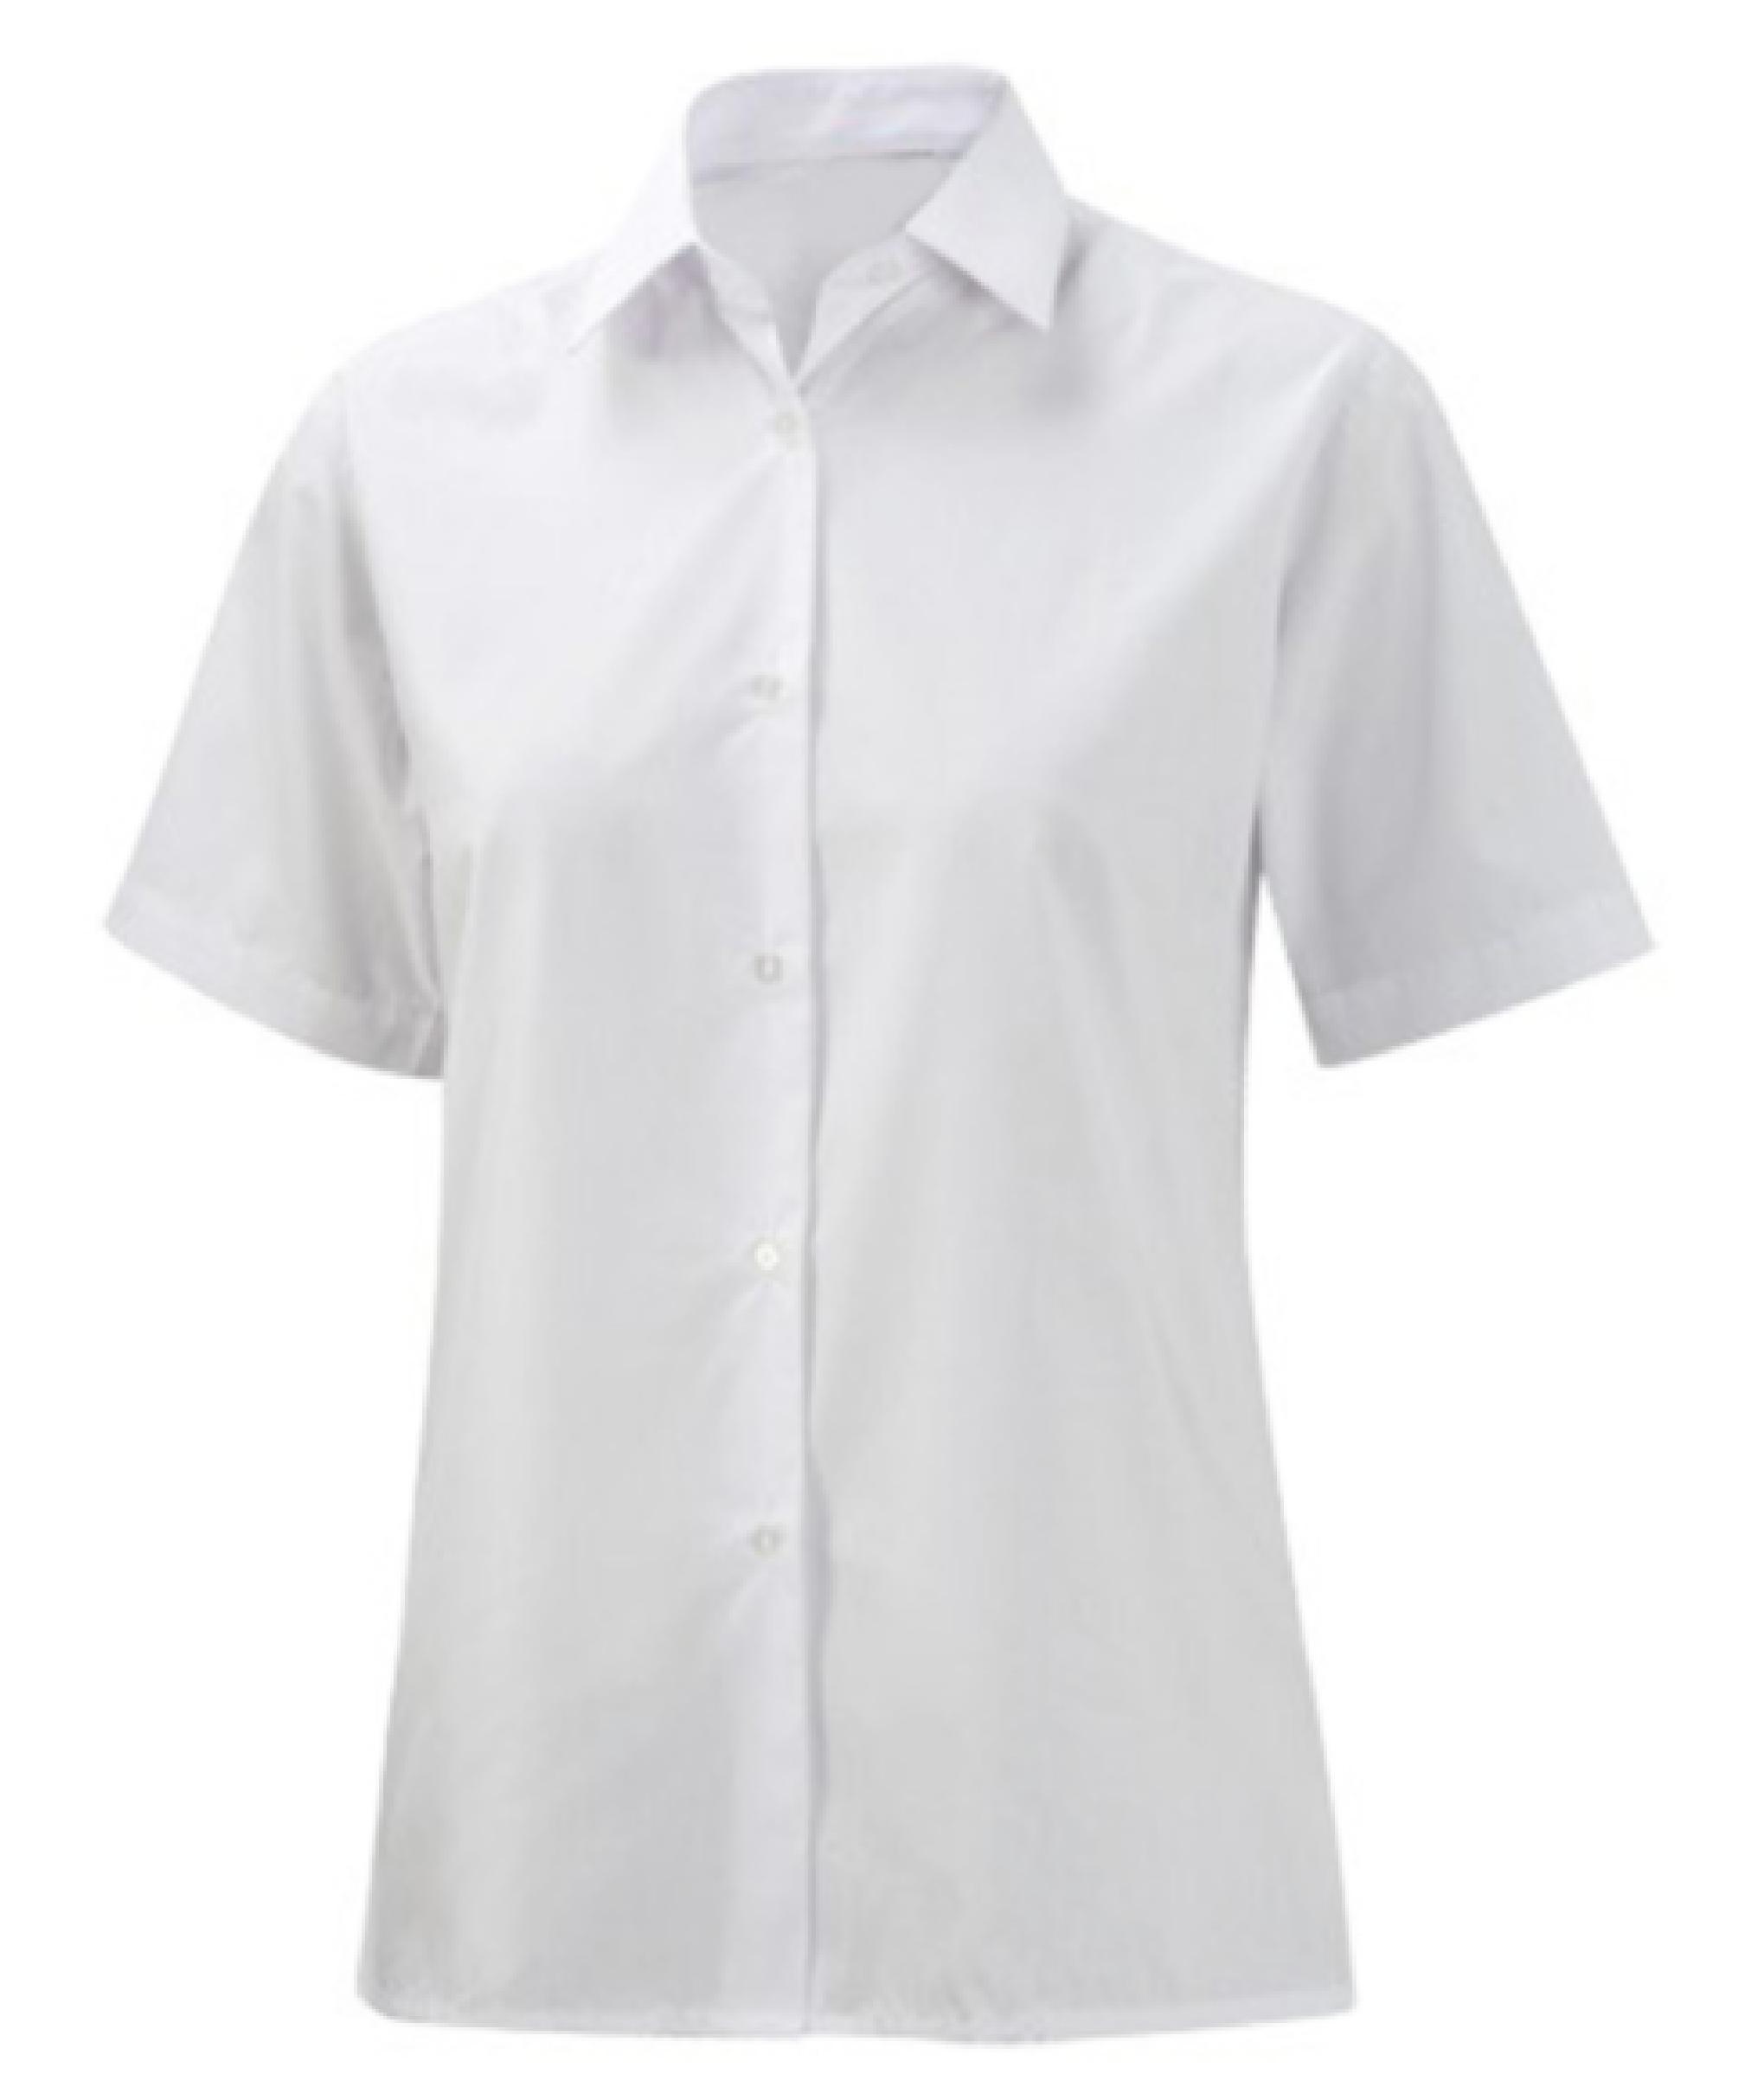 Boys School White Shirt